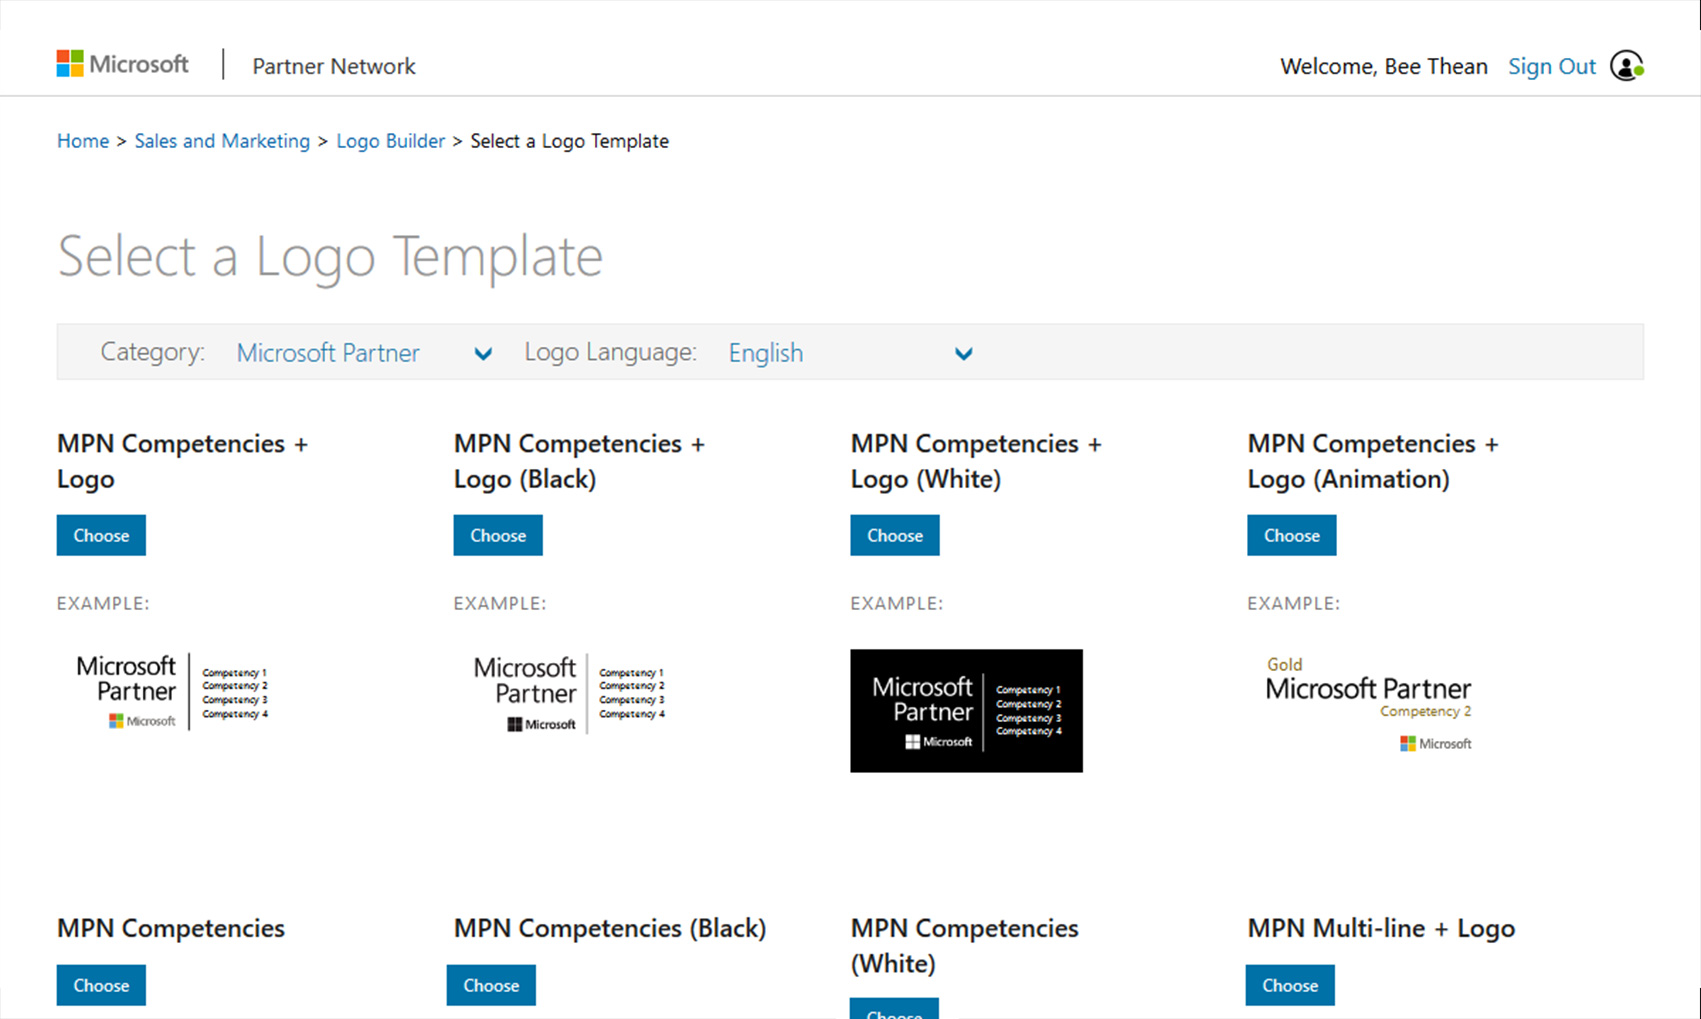 Microsoft LogoBuilder